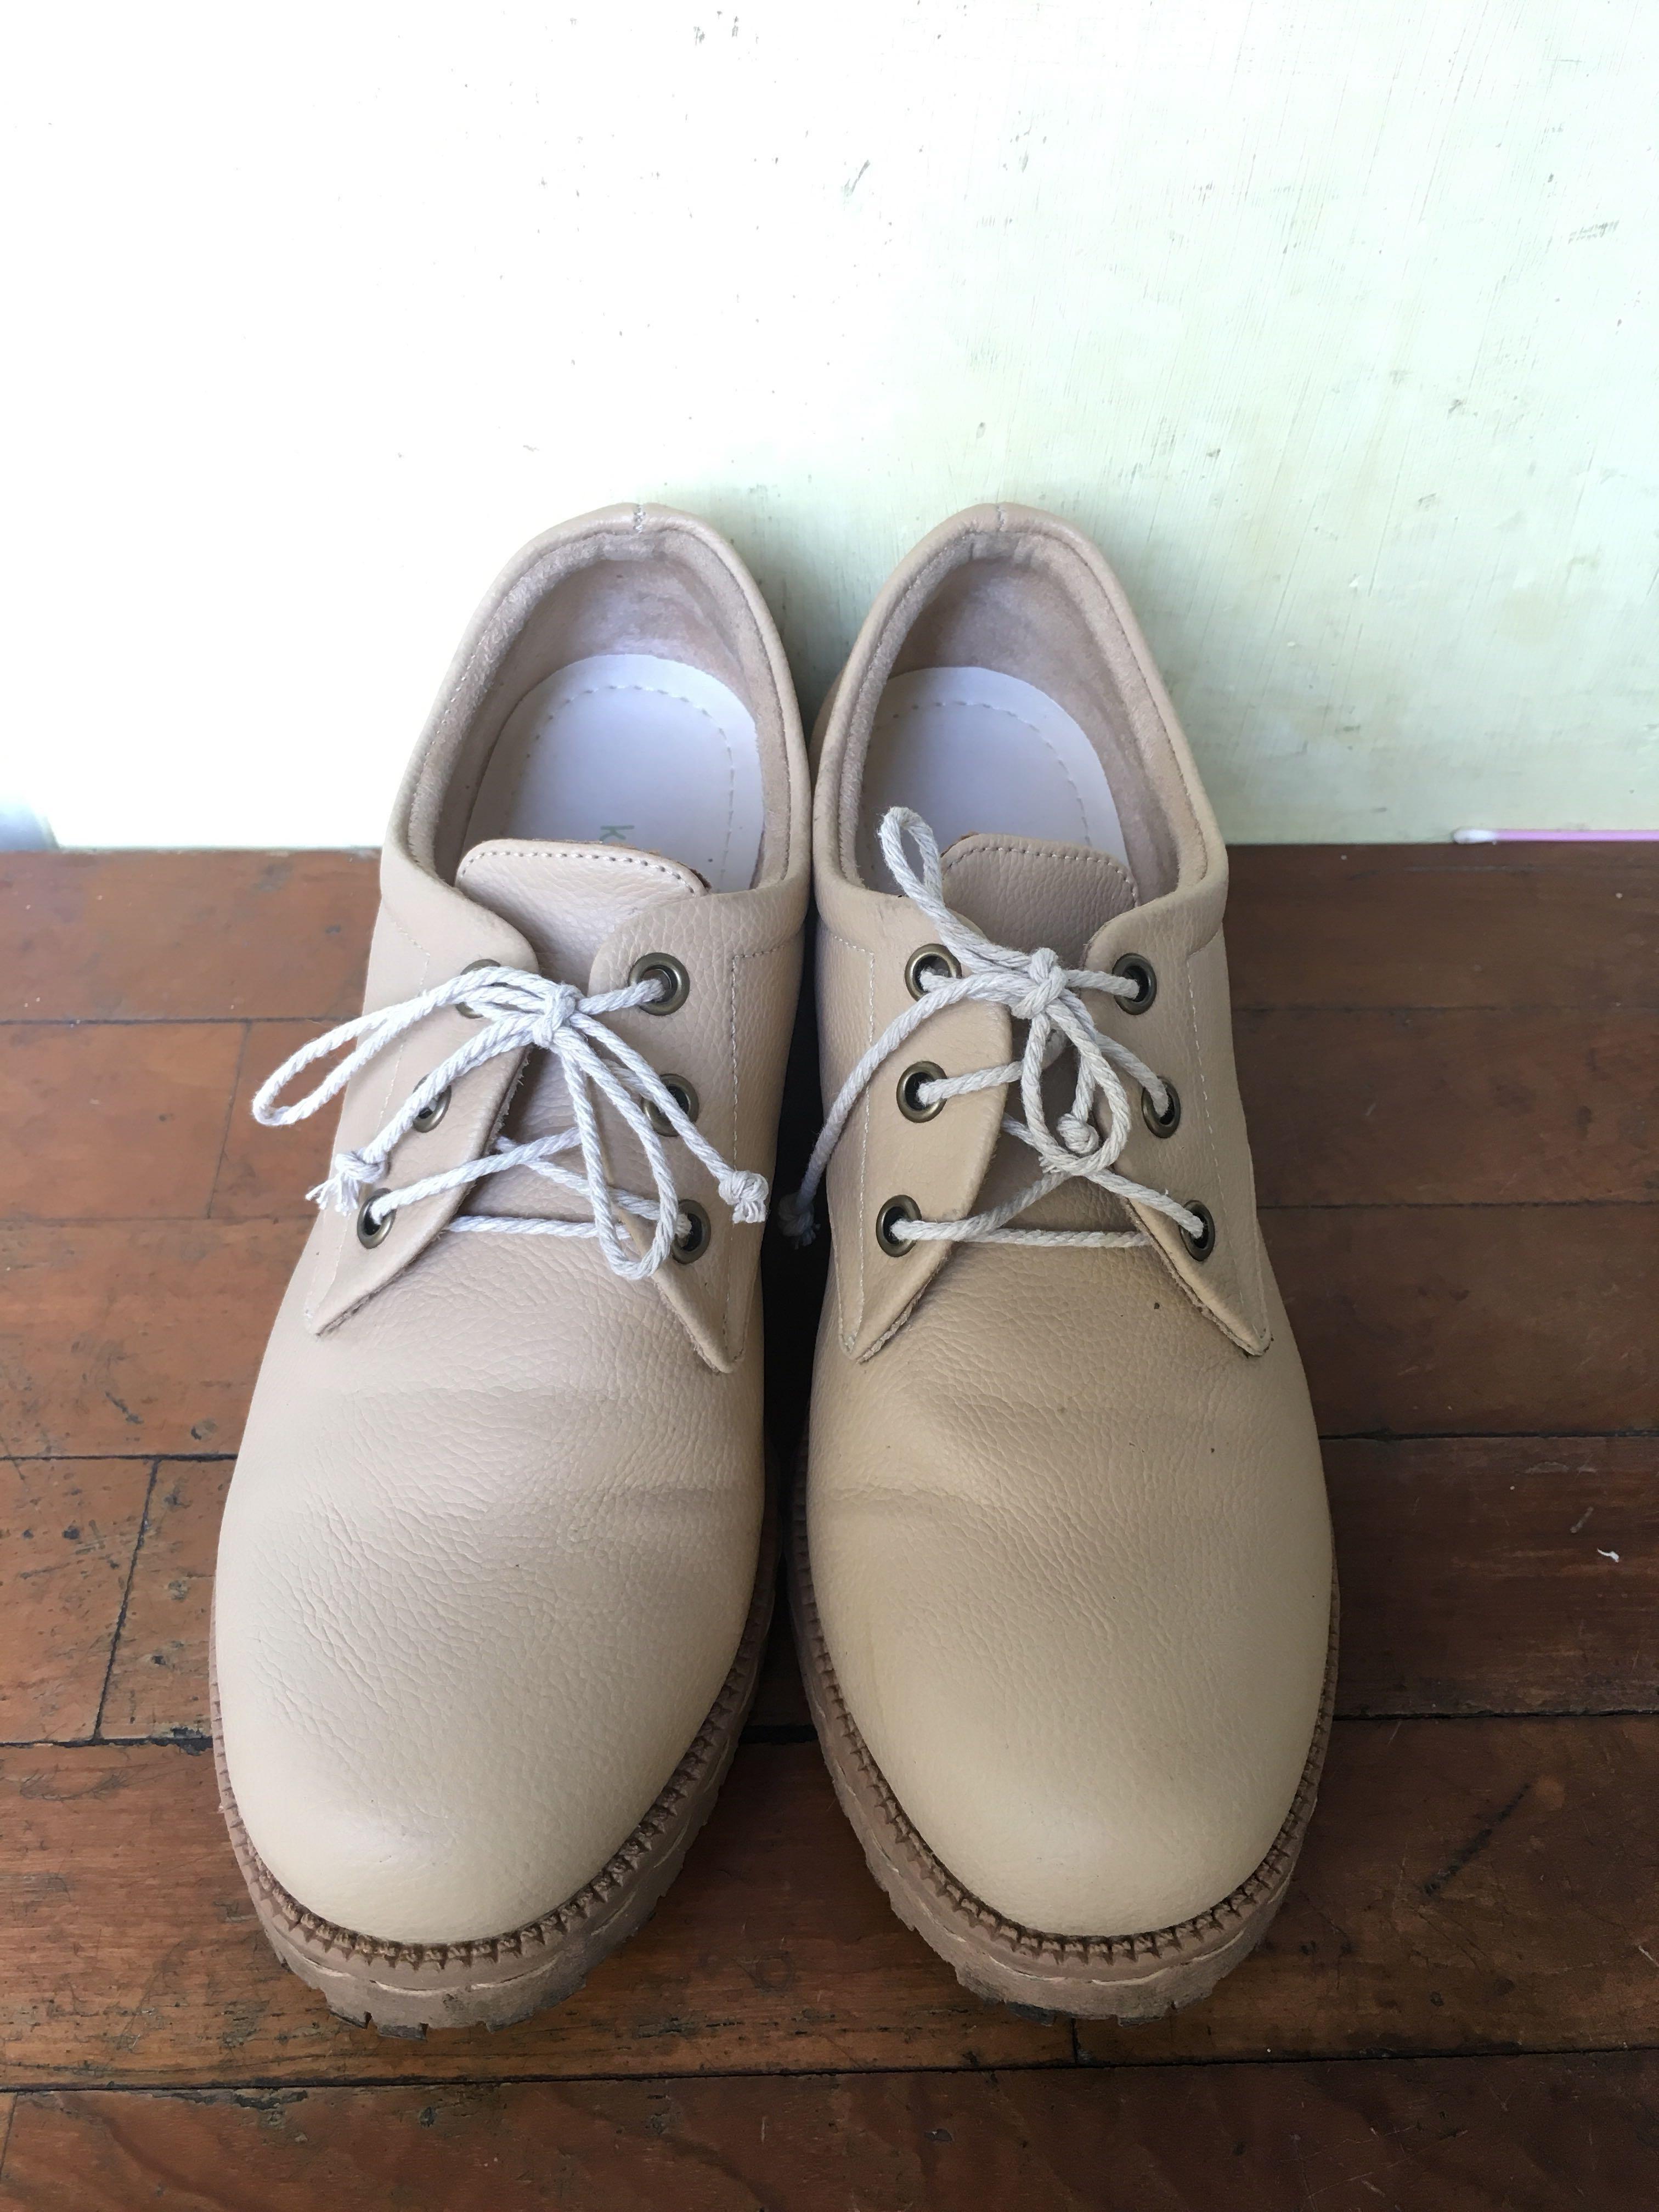 #Reprice - Sepatu boots khakikakiku